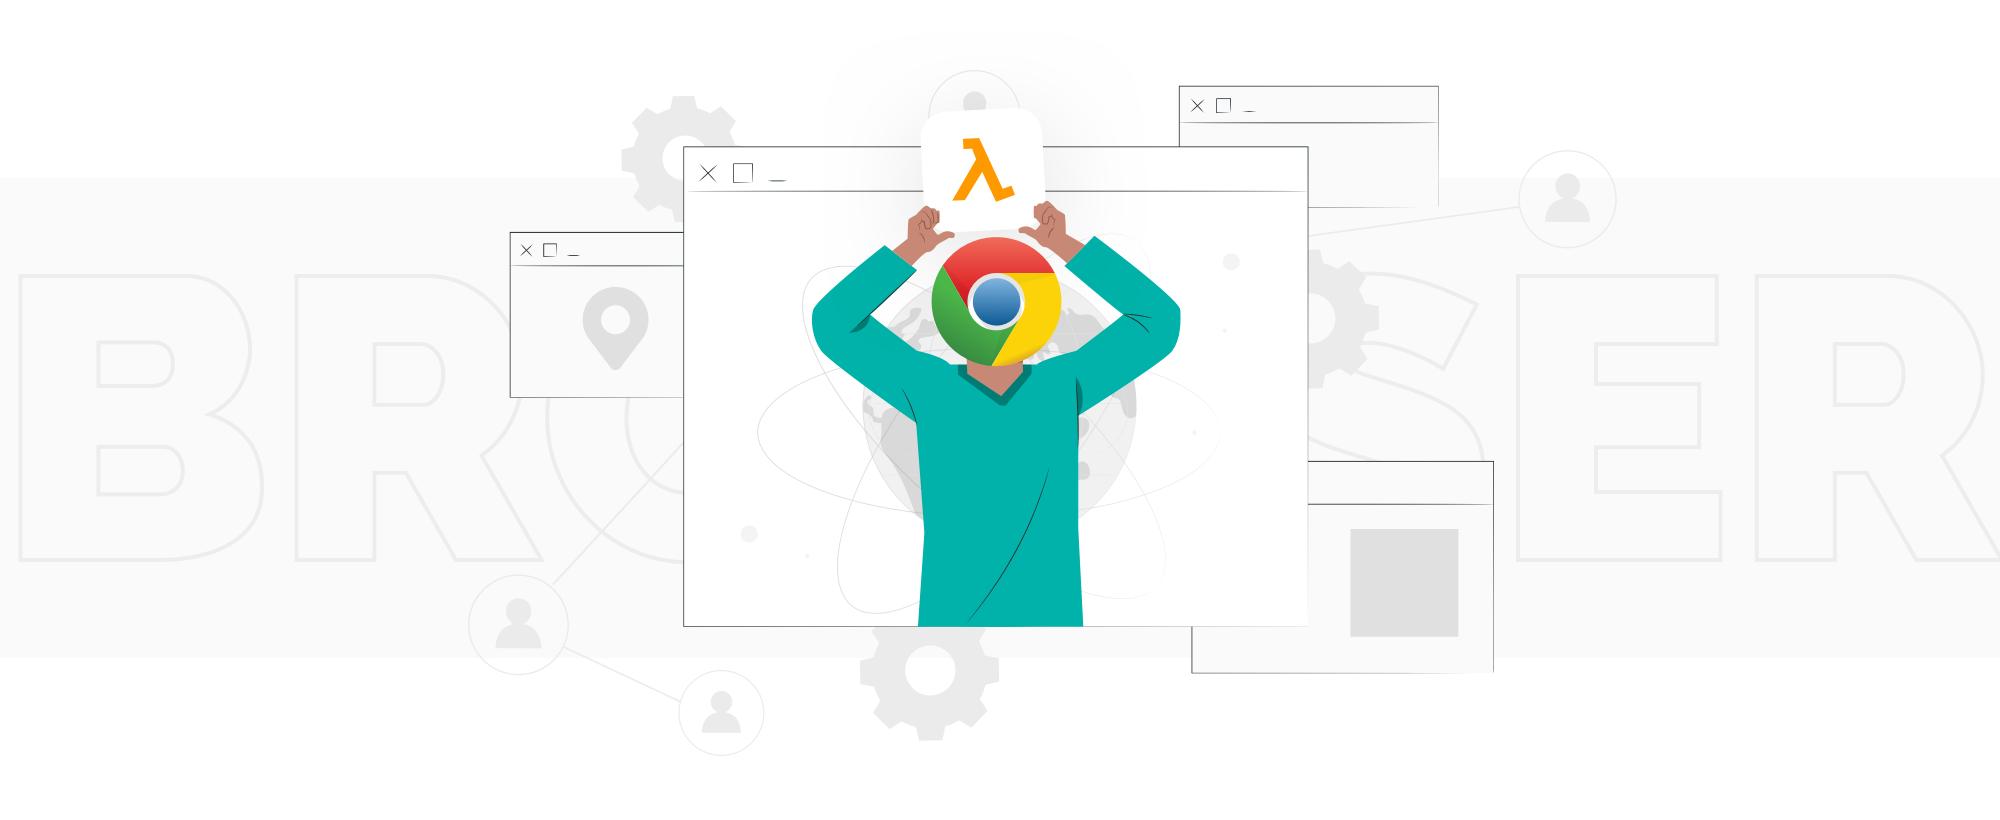 Running a Headless Chrome   TechMagic.co